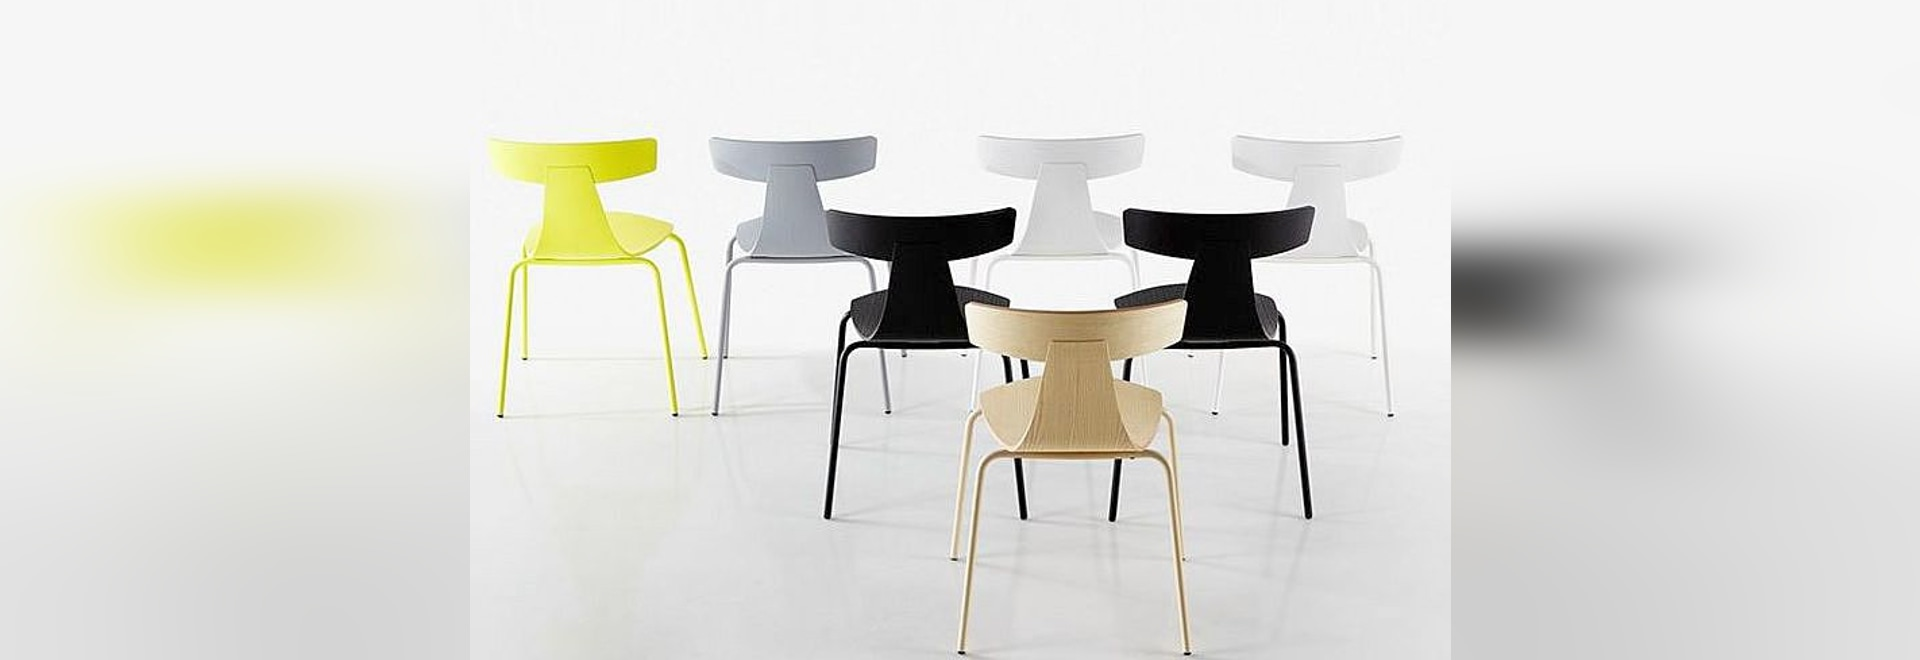 REMO METAL Chair, design Konstantin Grcic